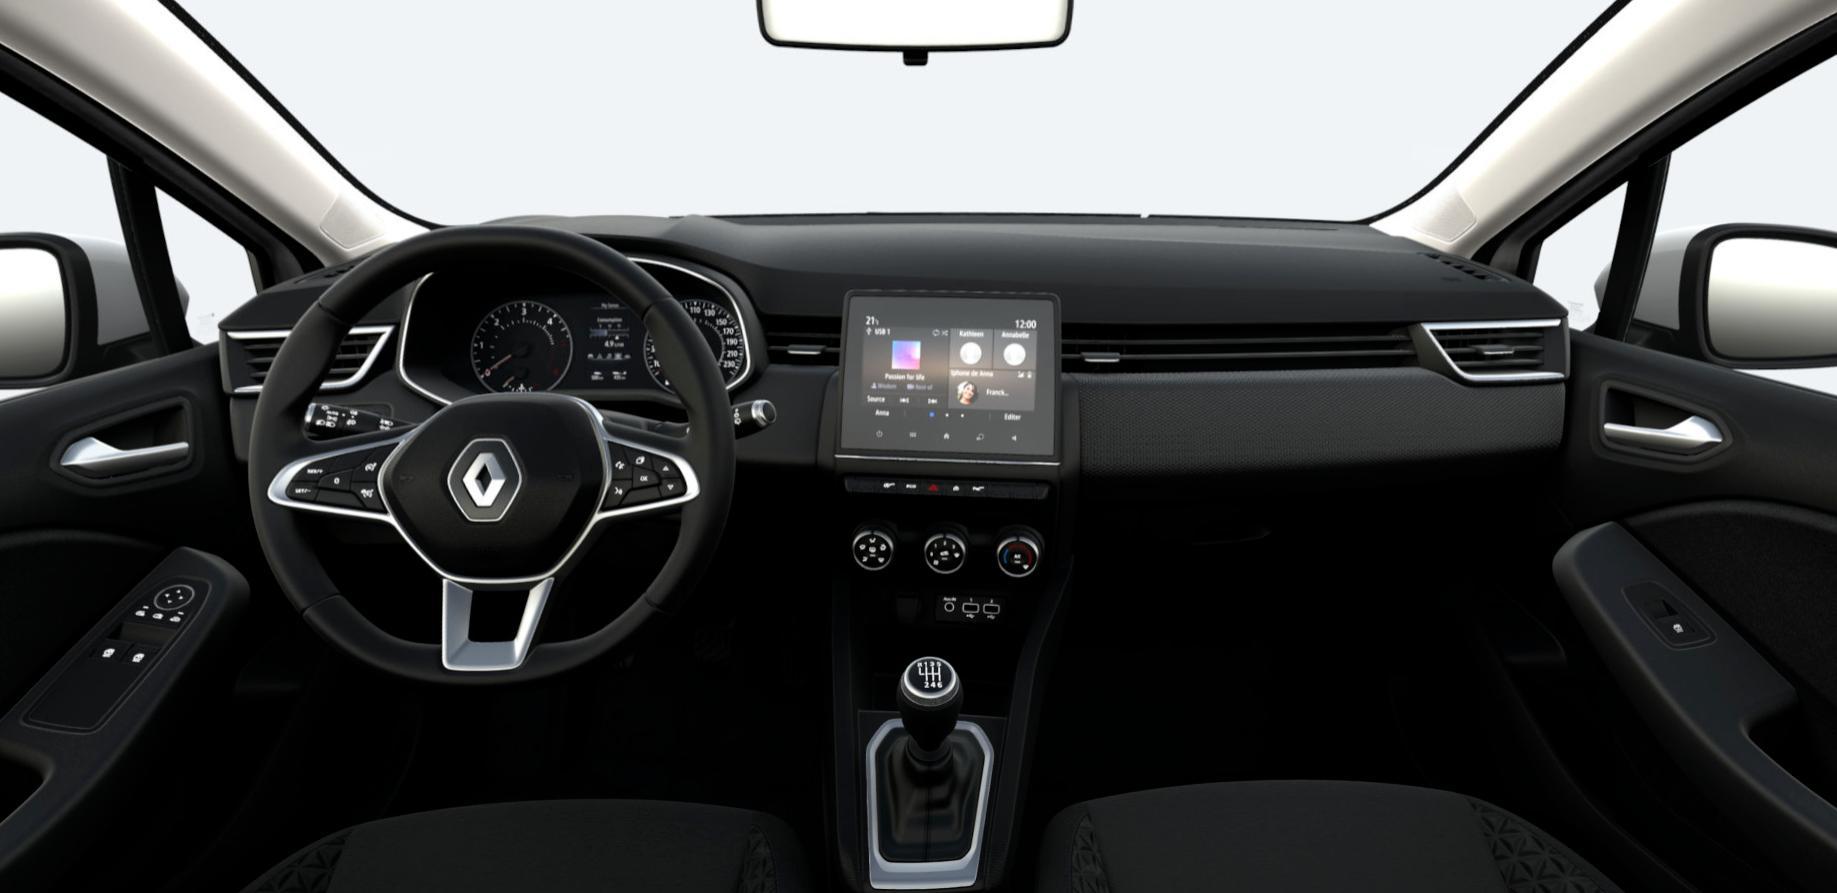 Interior Renault Clio Interior Frontal